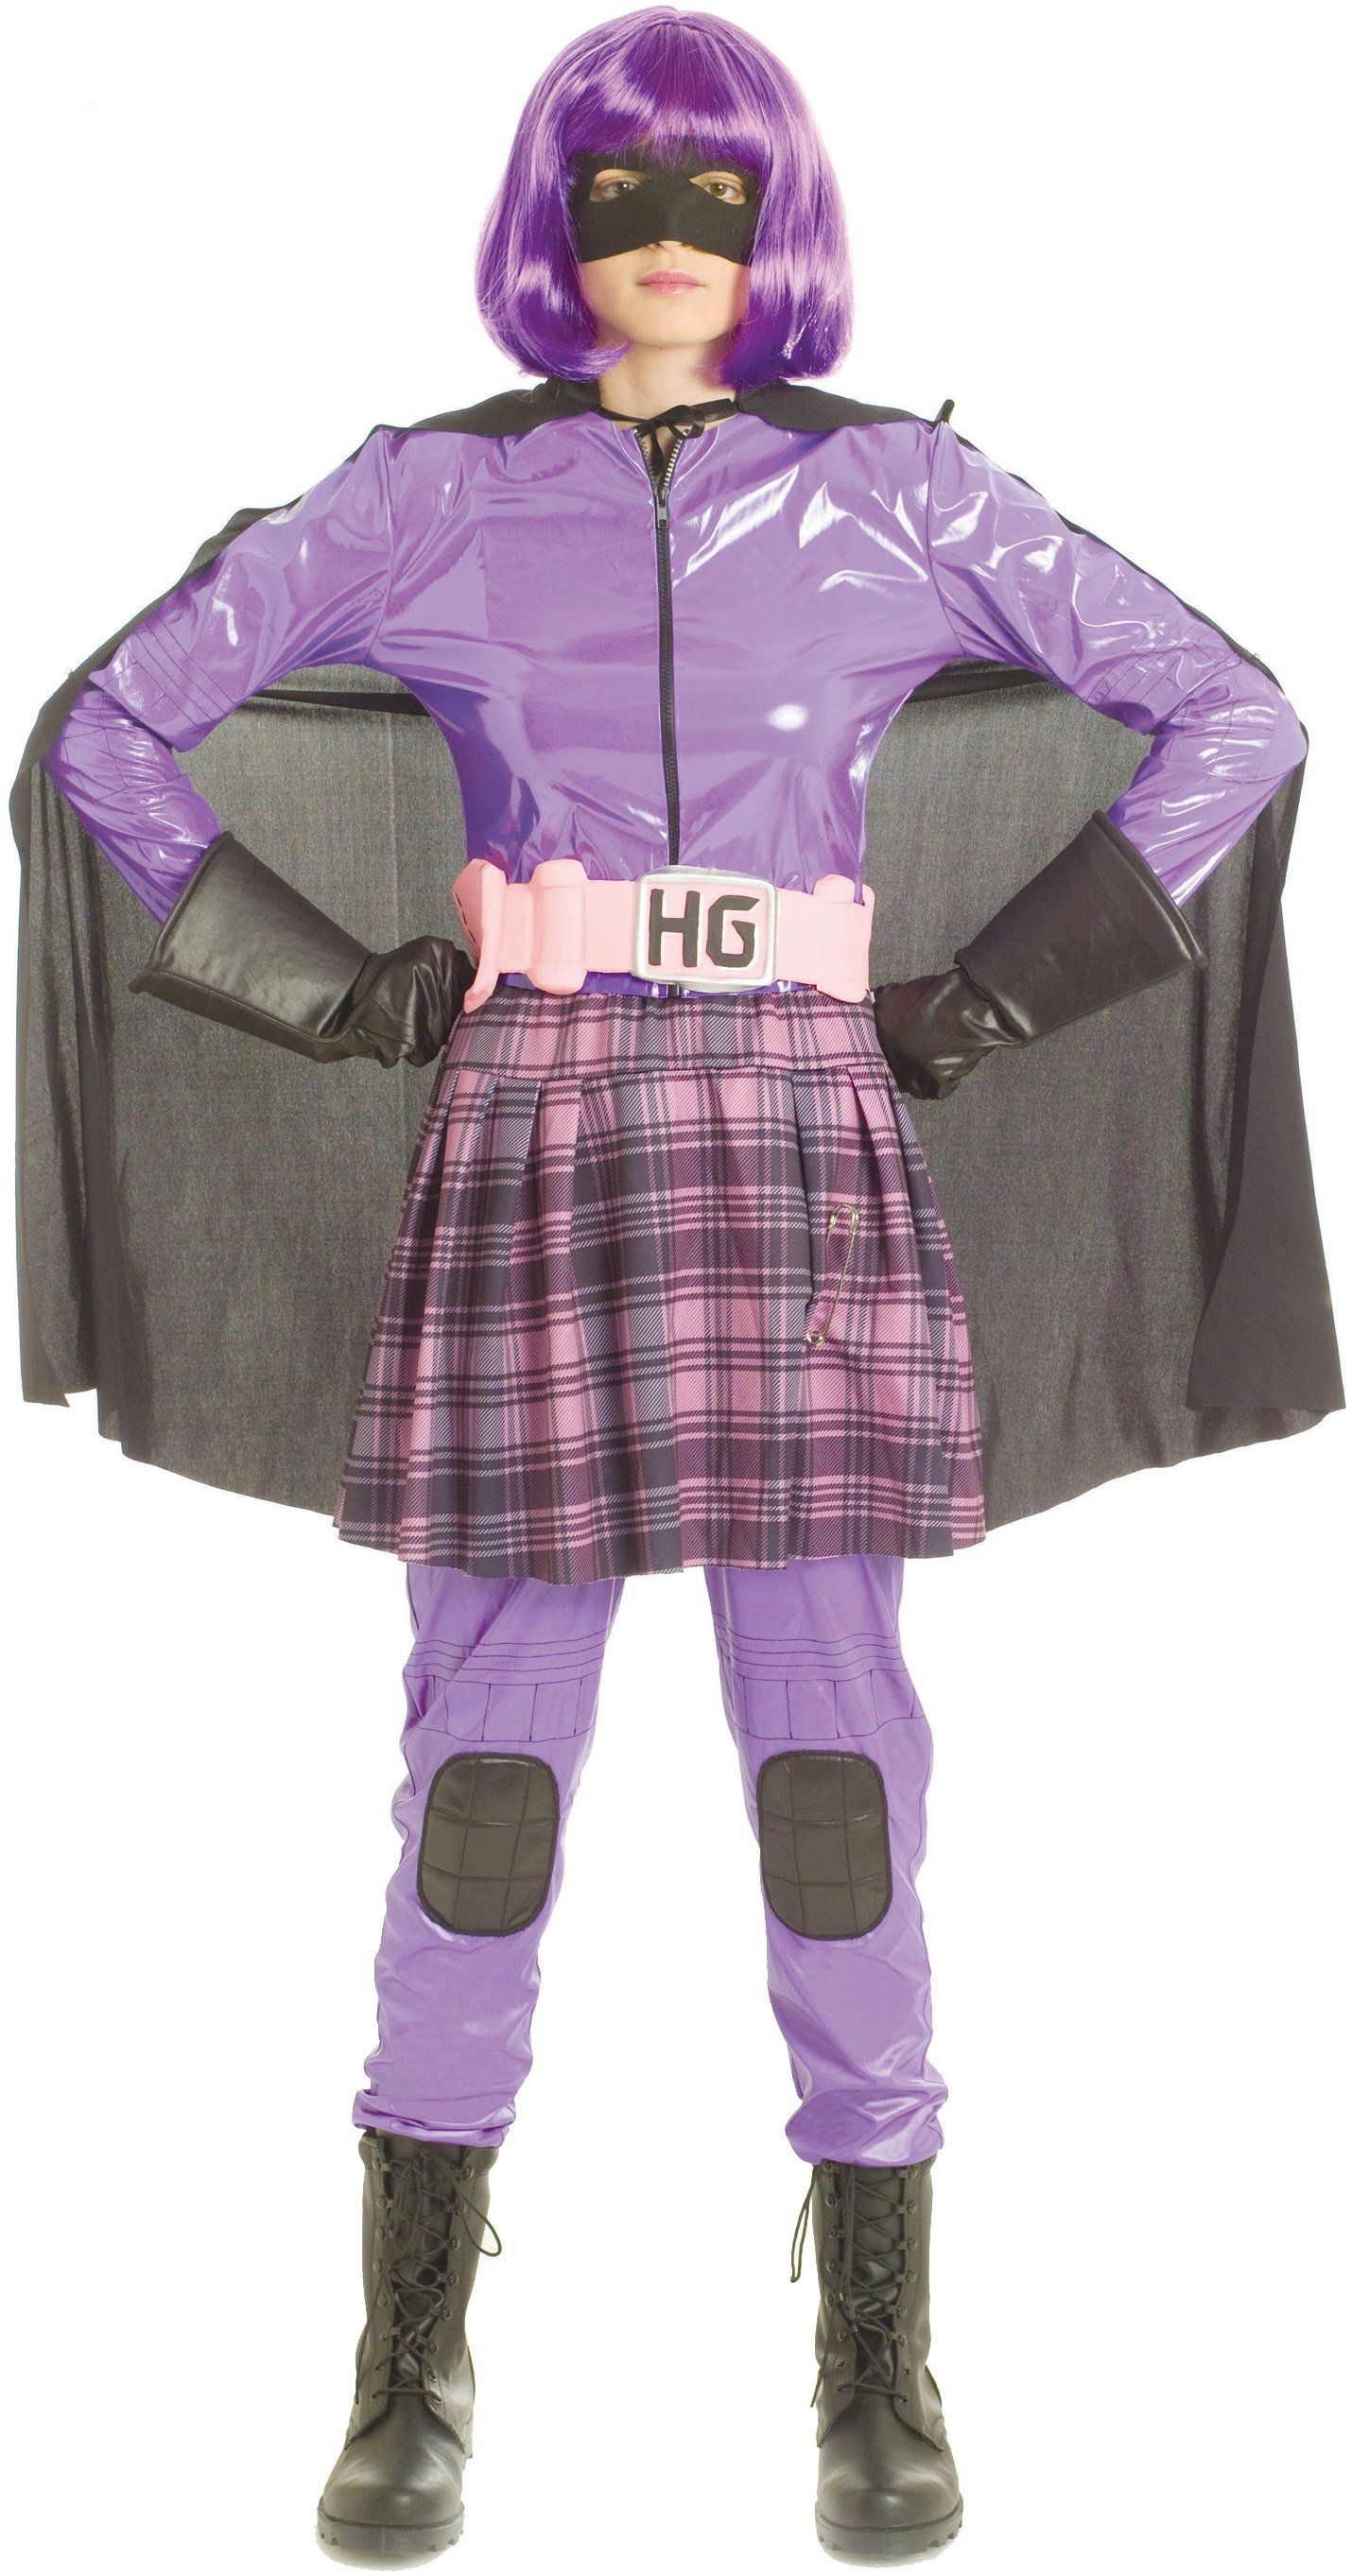 Werewolf costumes for girls girl costume halloween hit also best ideas images on pinterest in rh